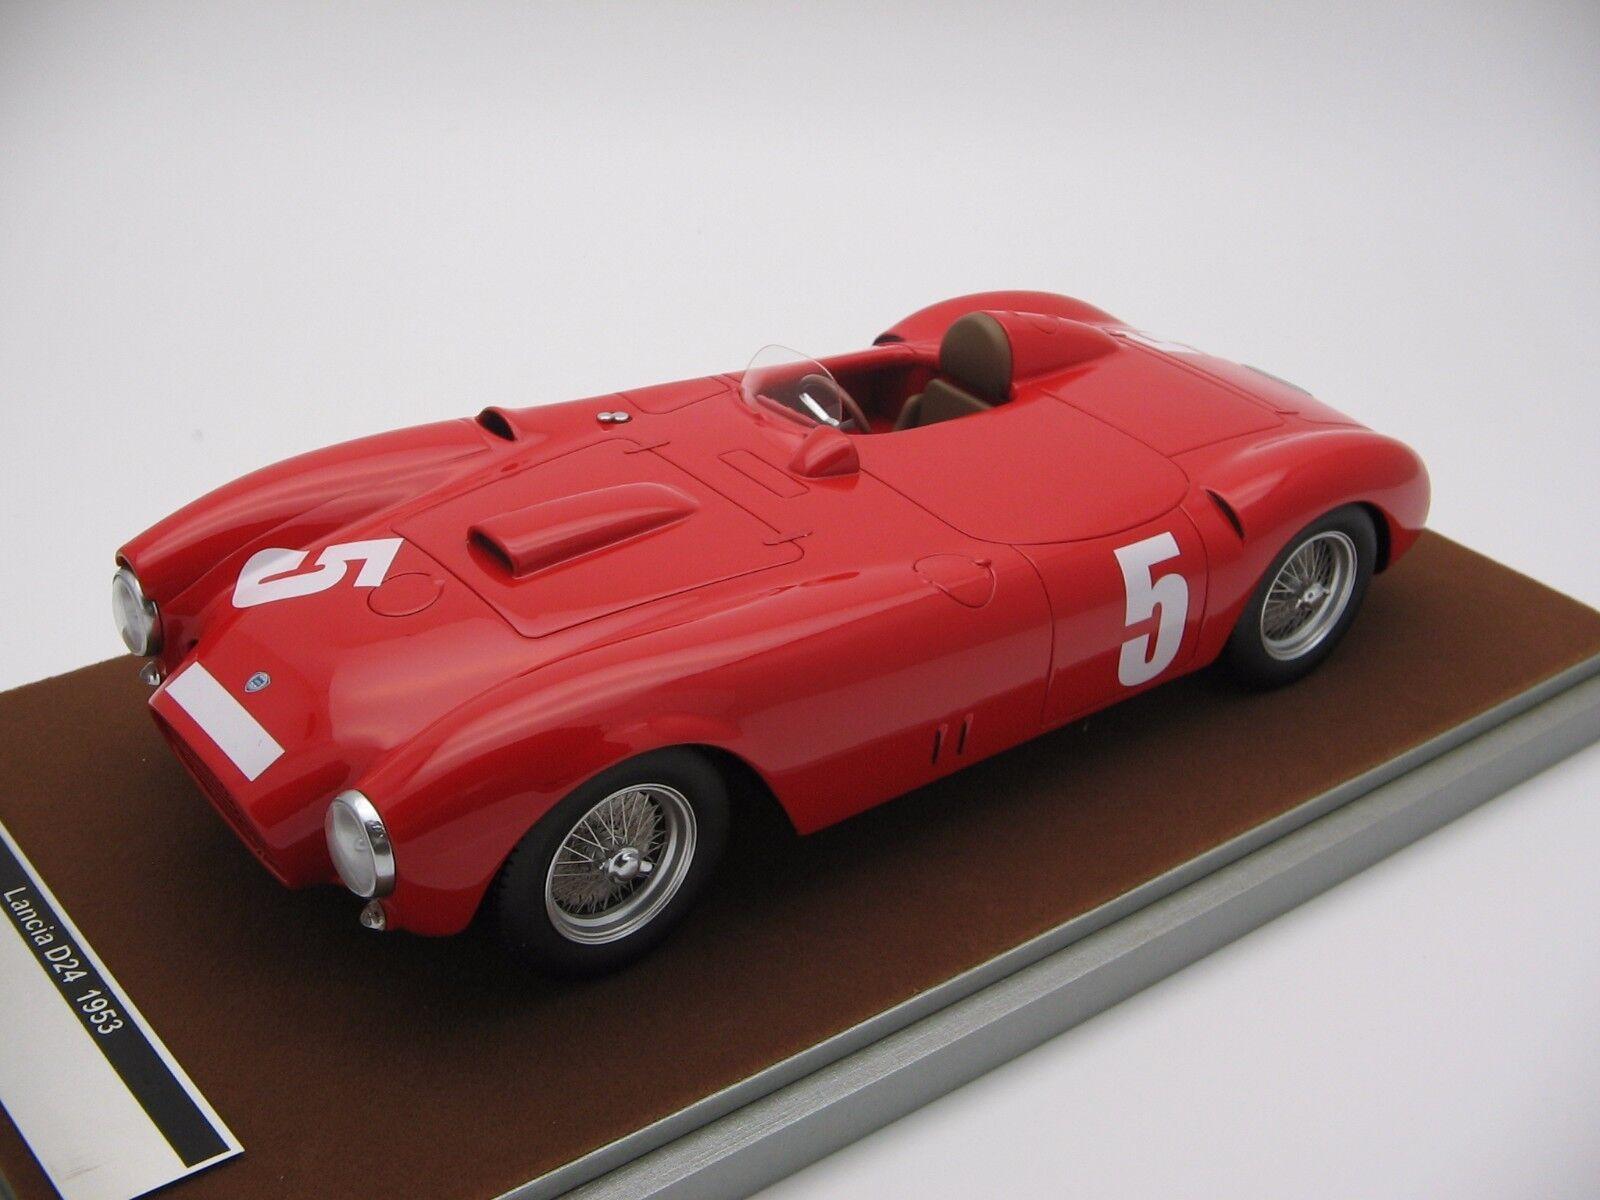 1 18 Scale Tecnomodel Lancia d24 Spyder Nurburgring 1953-tm18-43b